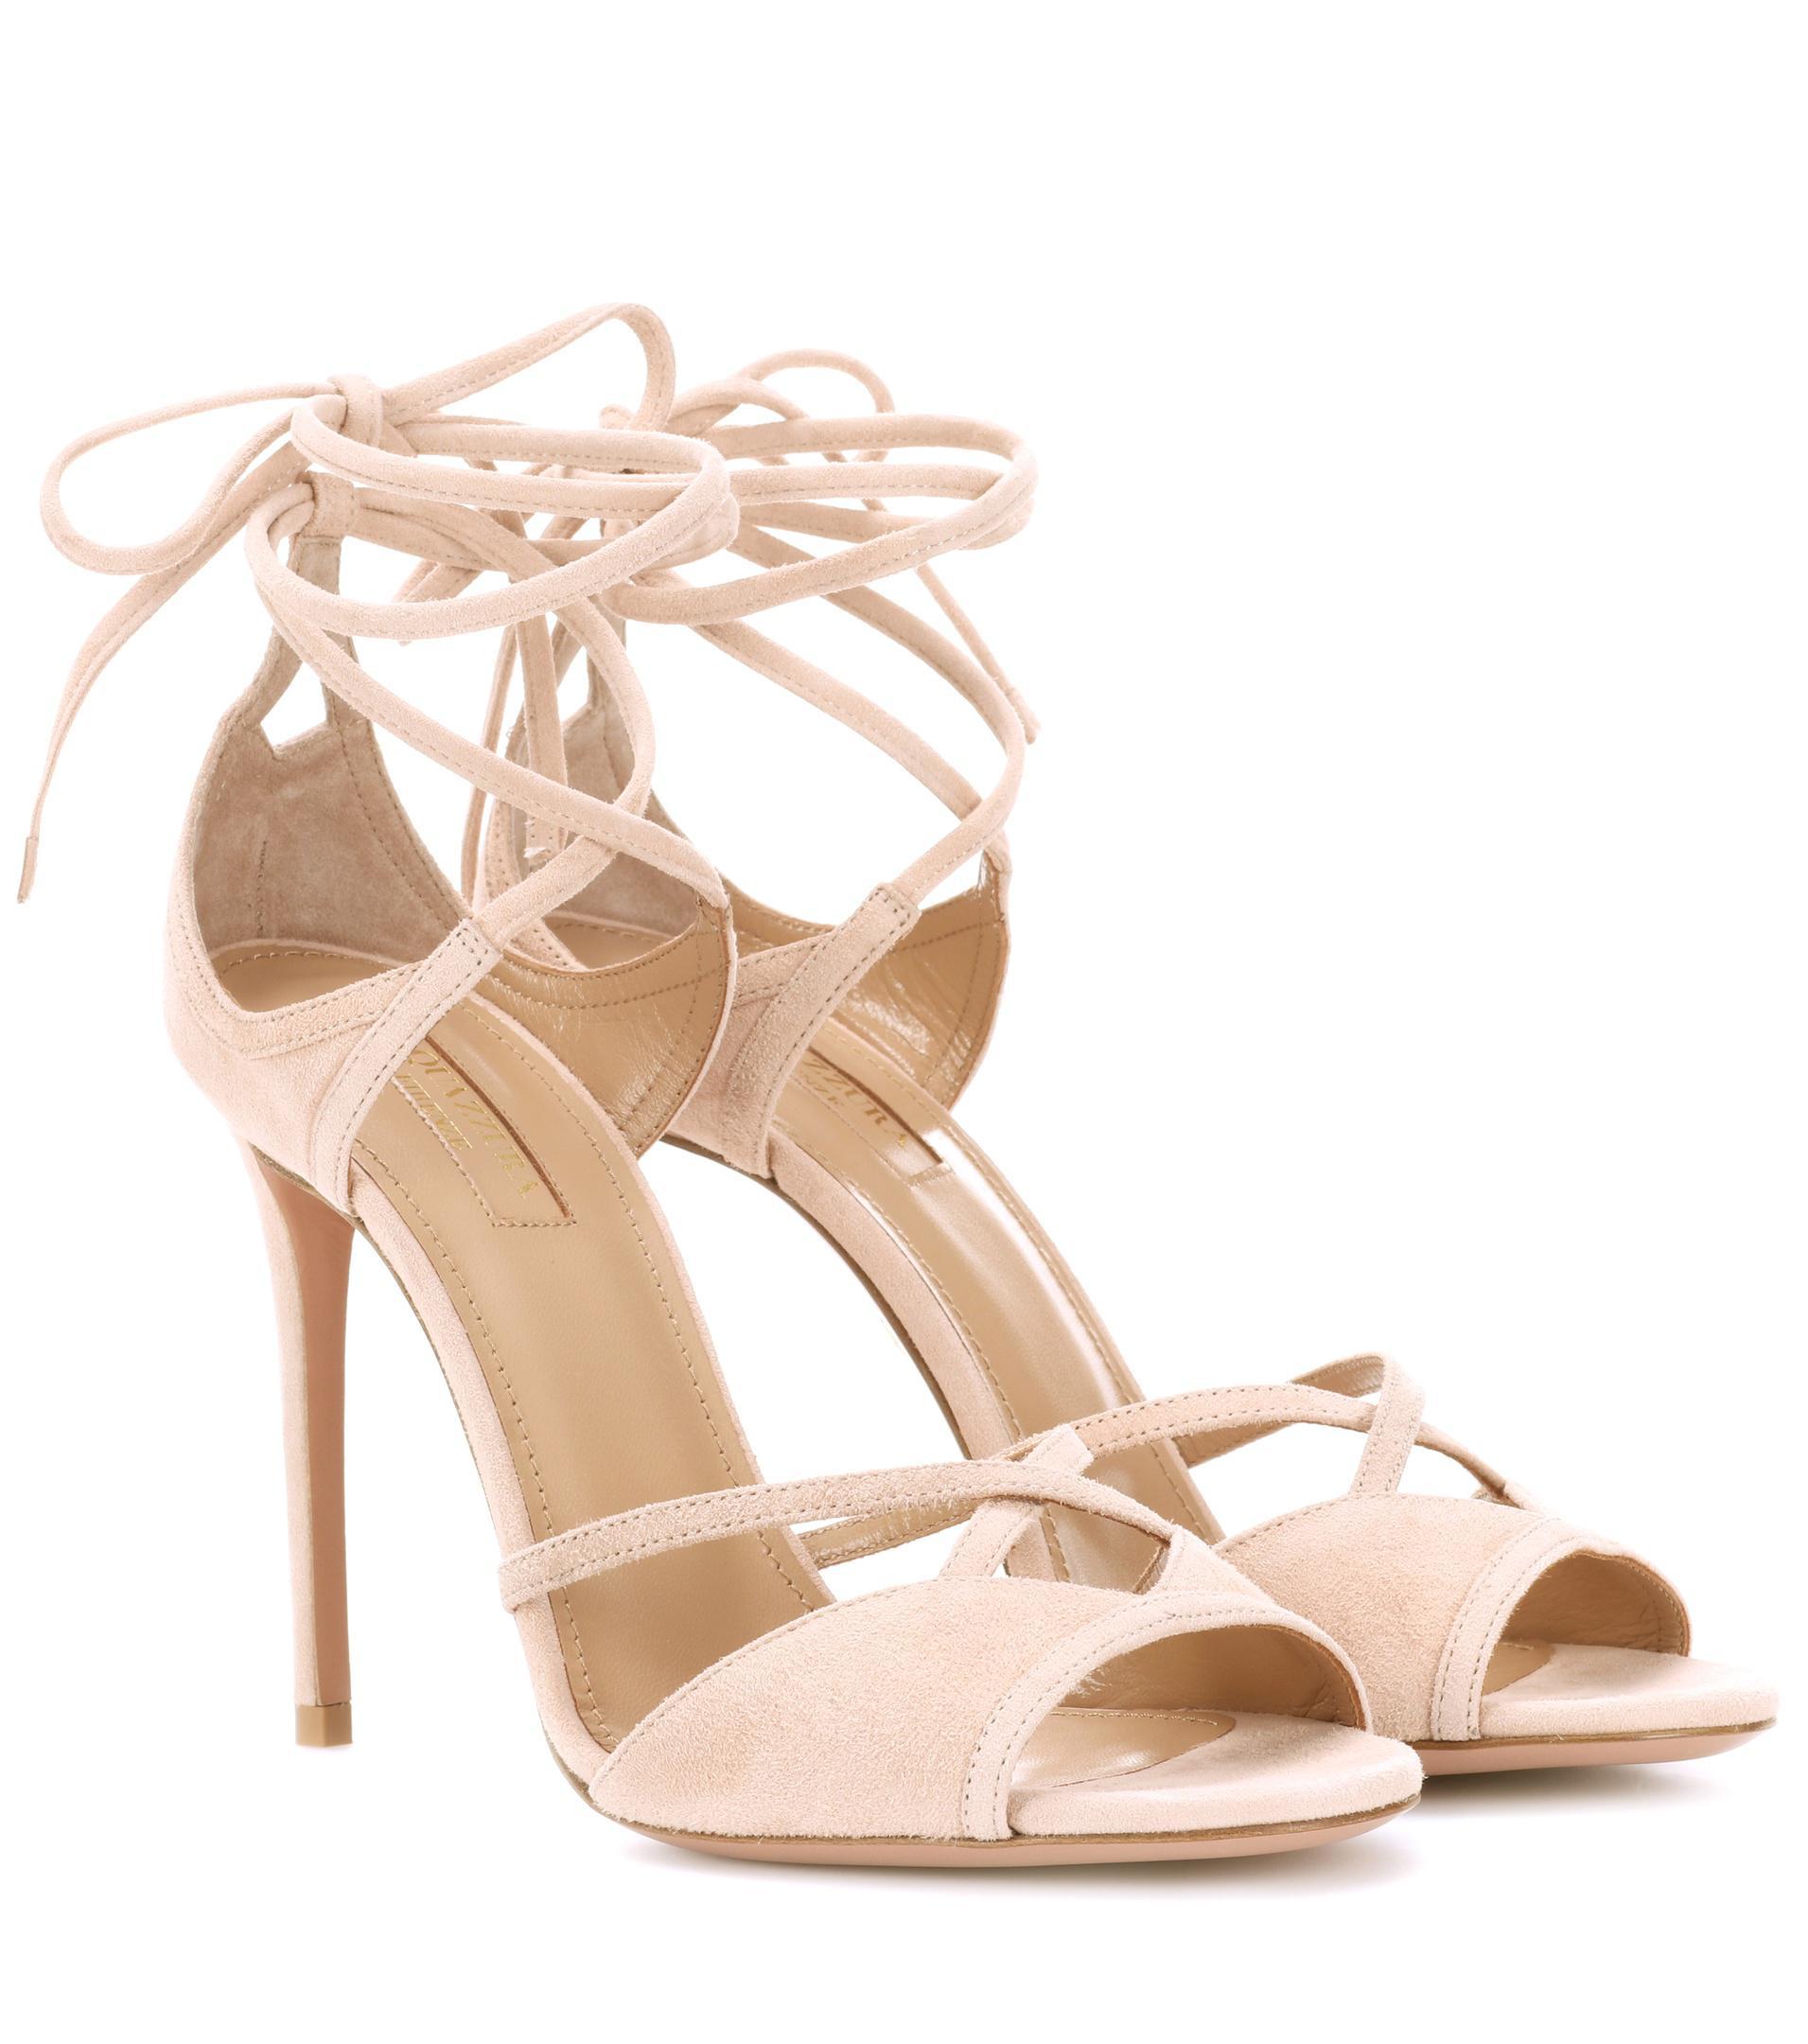 Nathalie 105 suede sandals Aquazzura 4hpKrawcxK